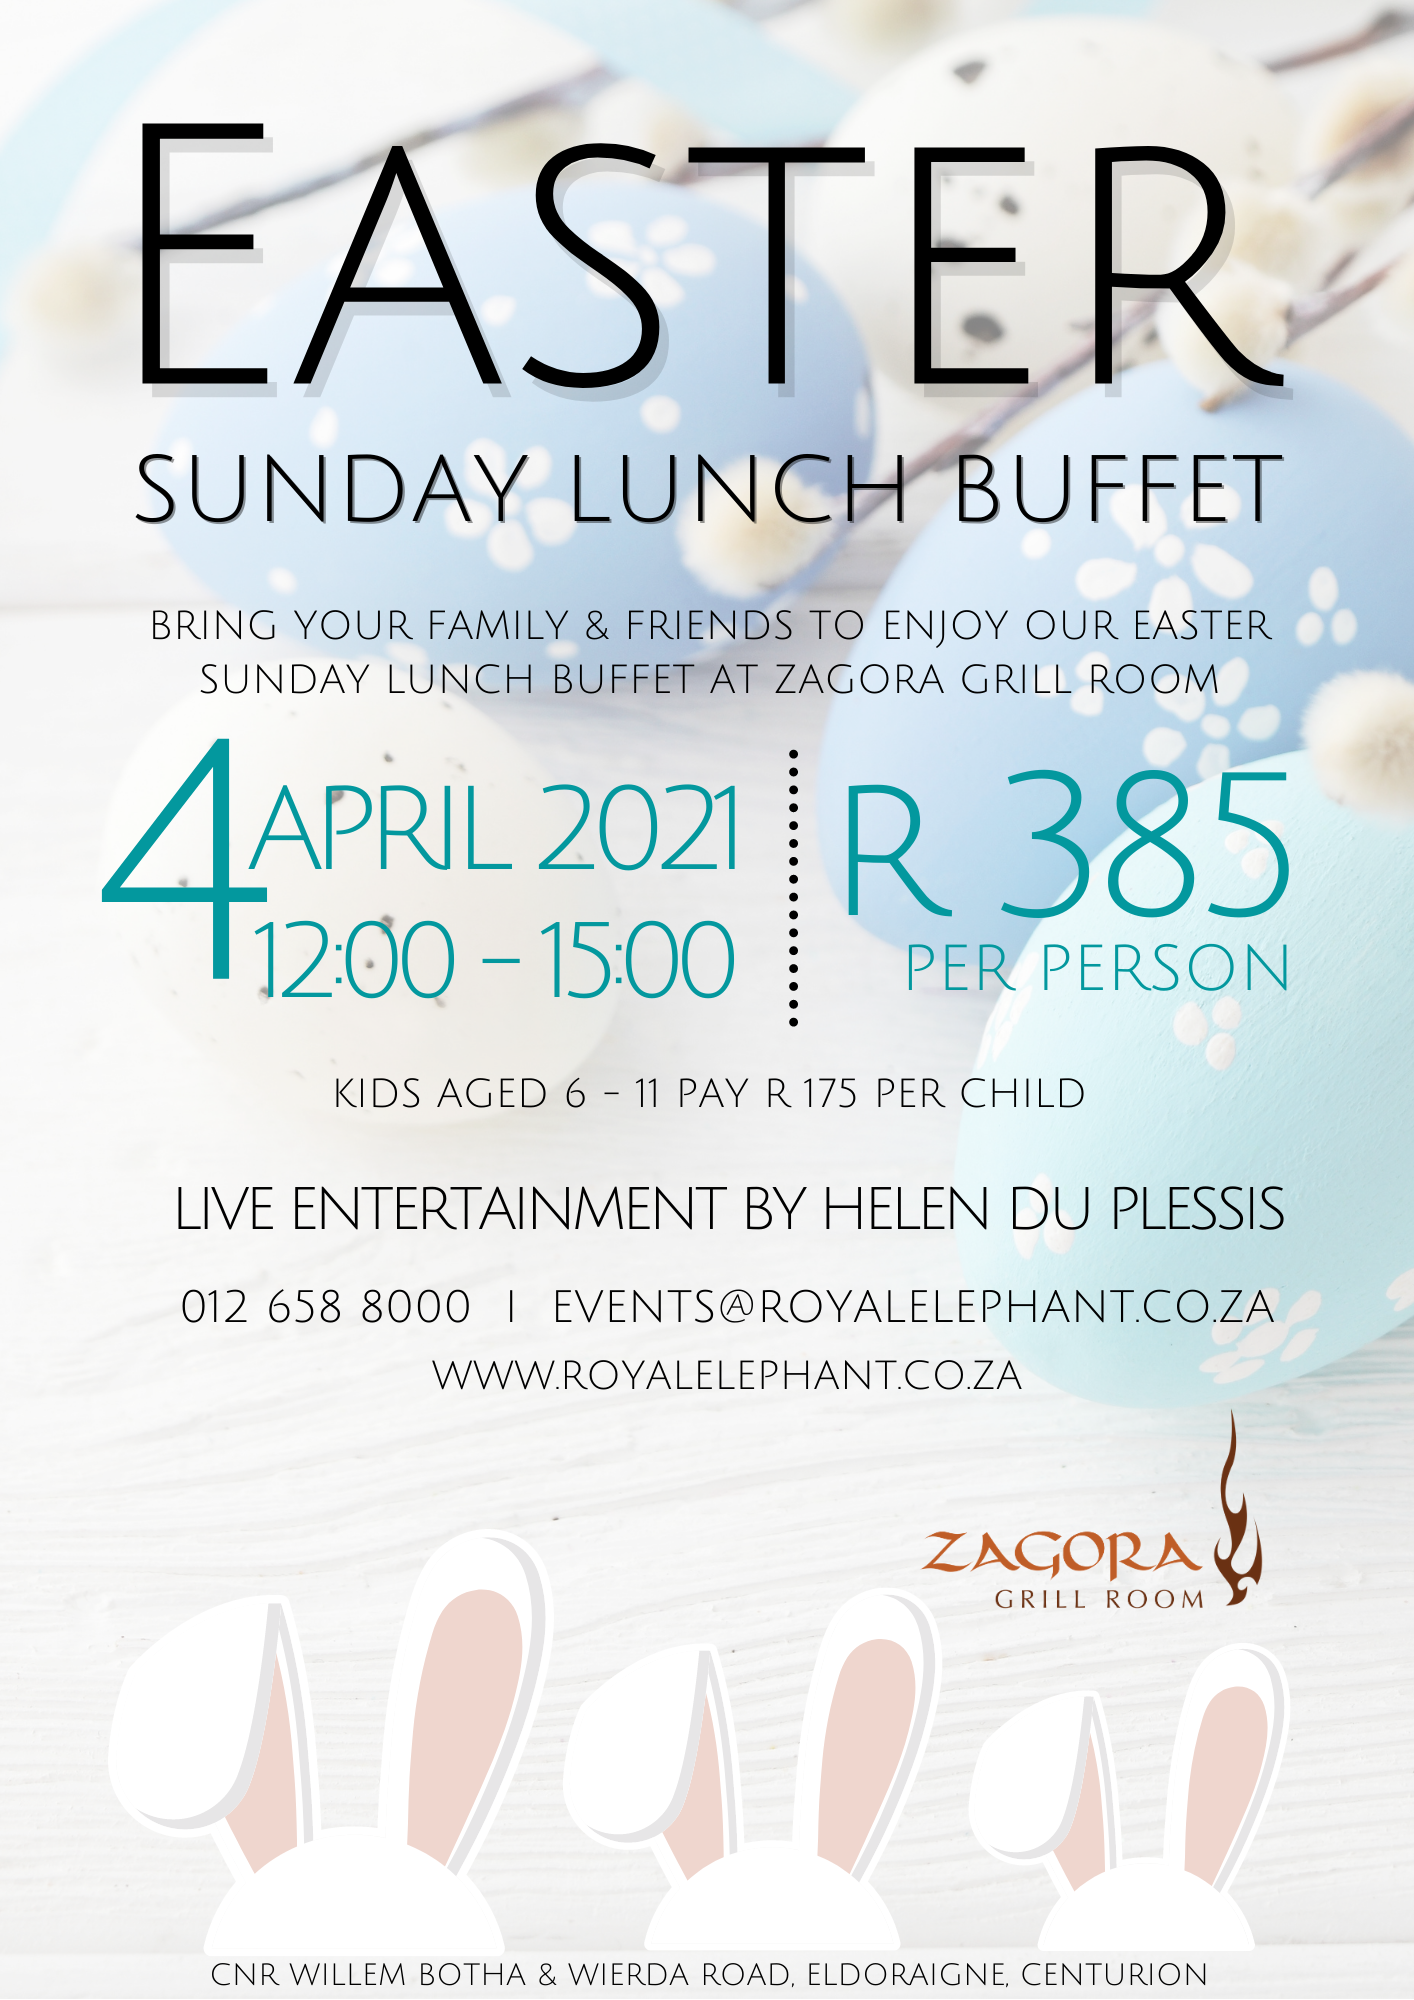 Easter Sunday Buffet at Zagora Grill Room